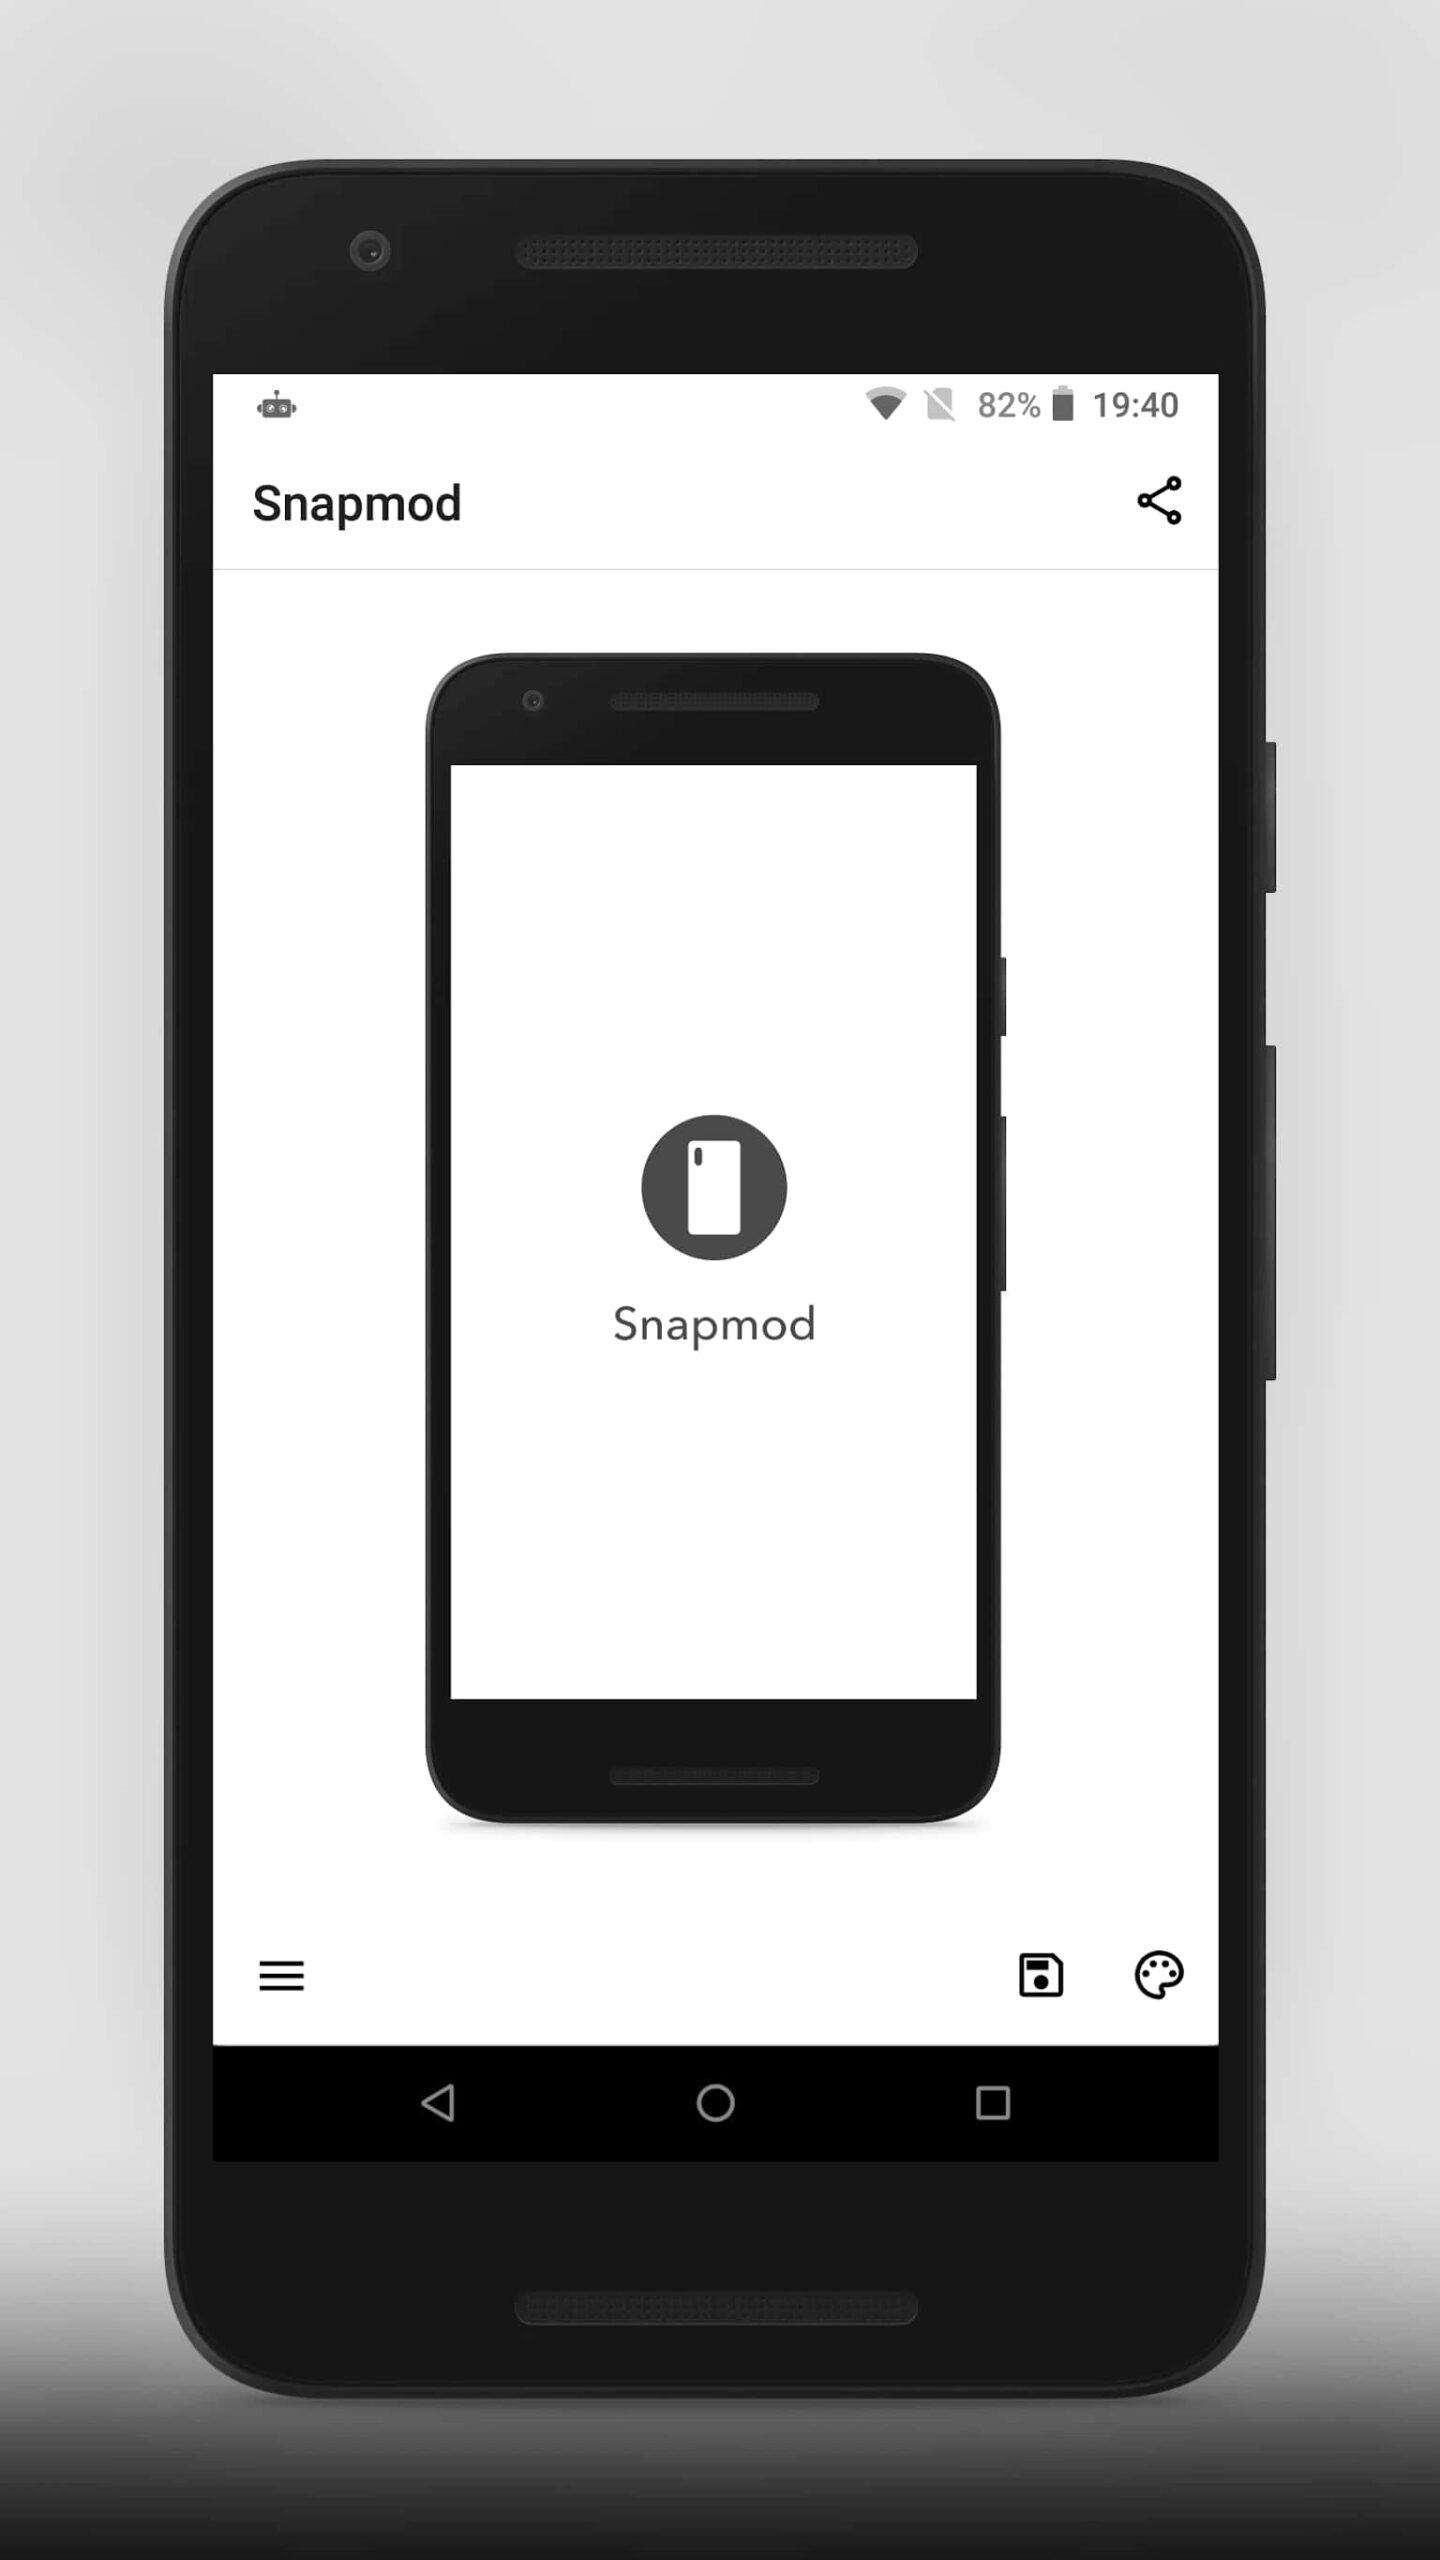 Snapmod – Better screenshots mockup generator